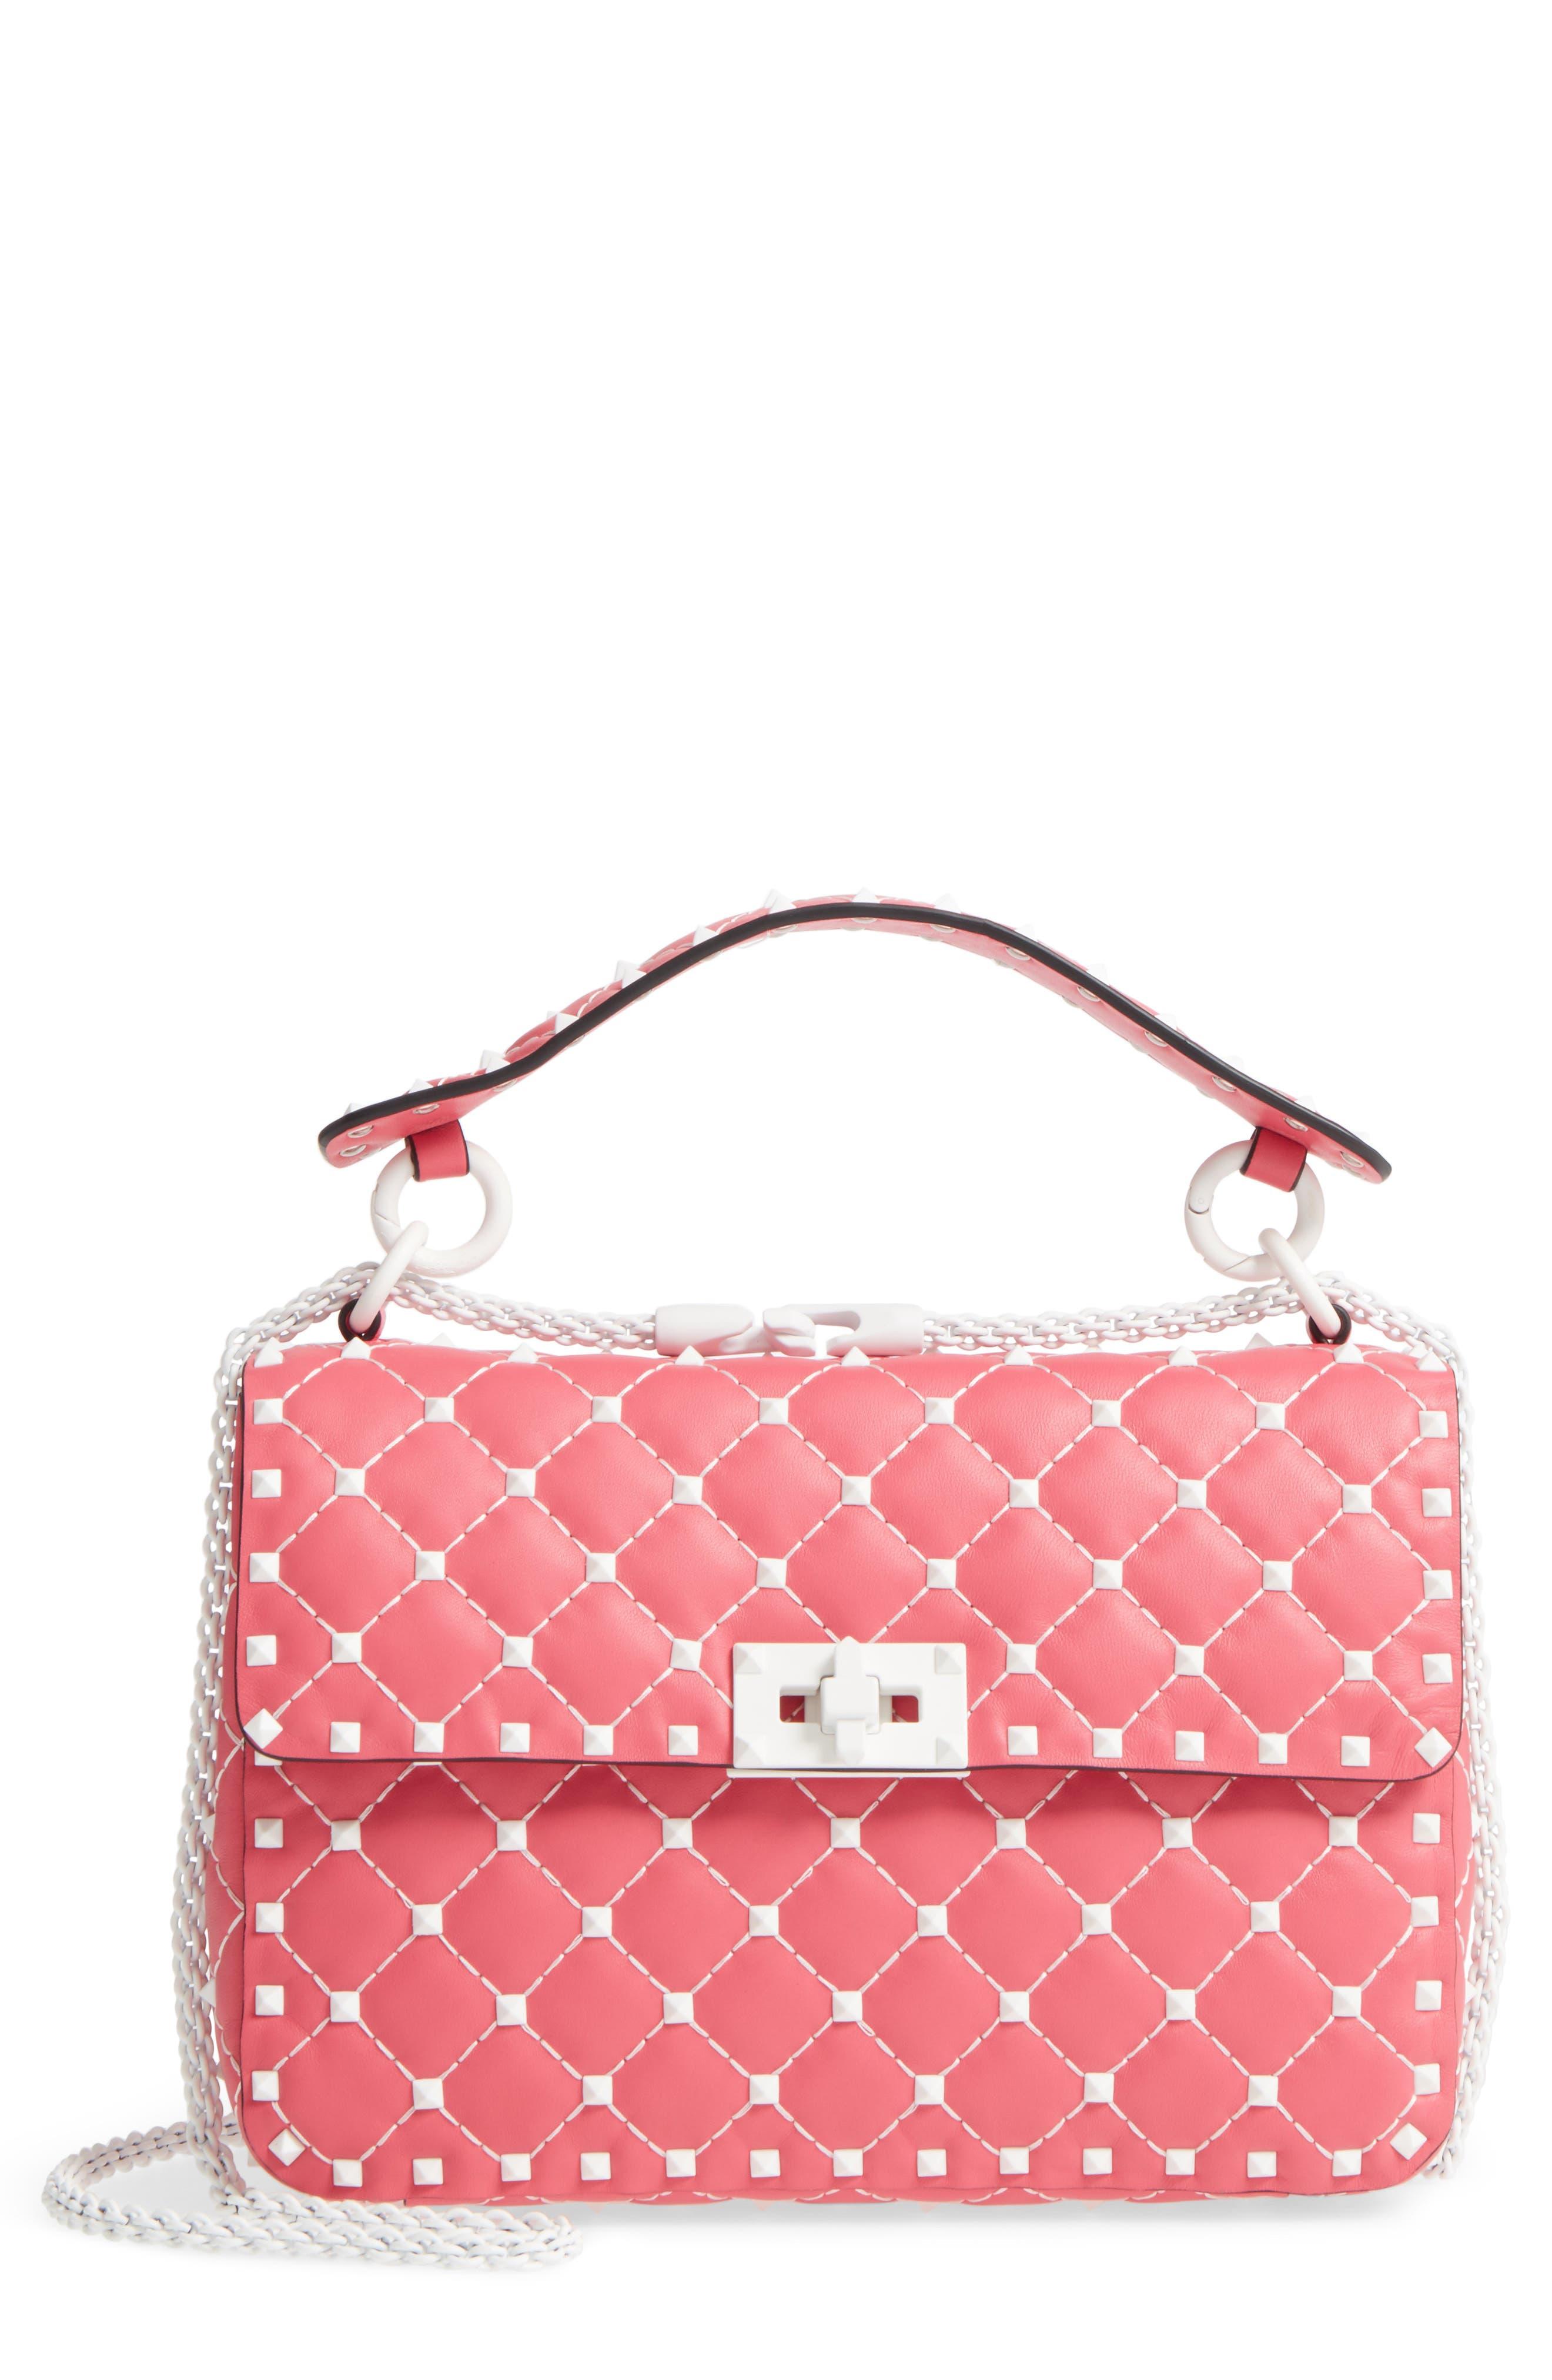 Medium Rockstud Matelassé Leather Shoulder Bag,                             Main thumbnail 3, color,